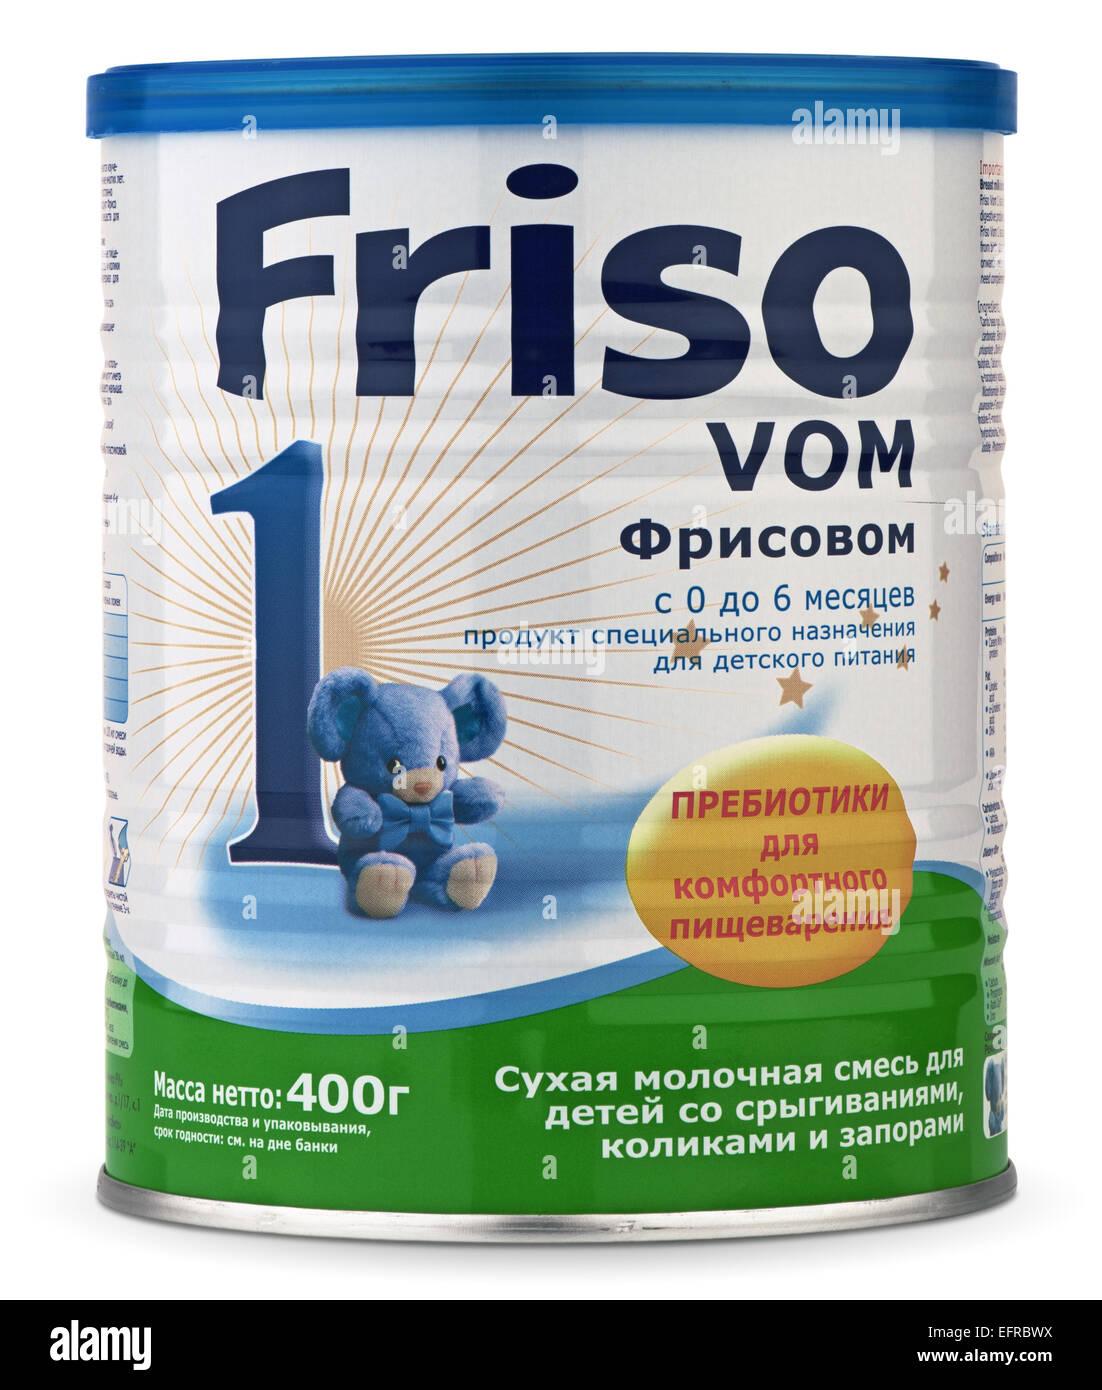 SOCHI, RUSSIA - FEBRUARY 09, 2015: Milk formula Friso VOM 1 with prebiotics based on cow's milk. Manufactured - Stock Image